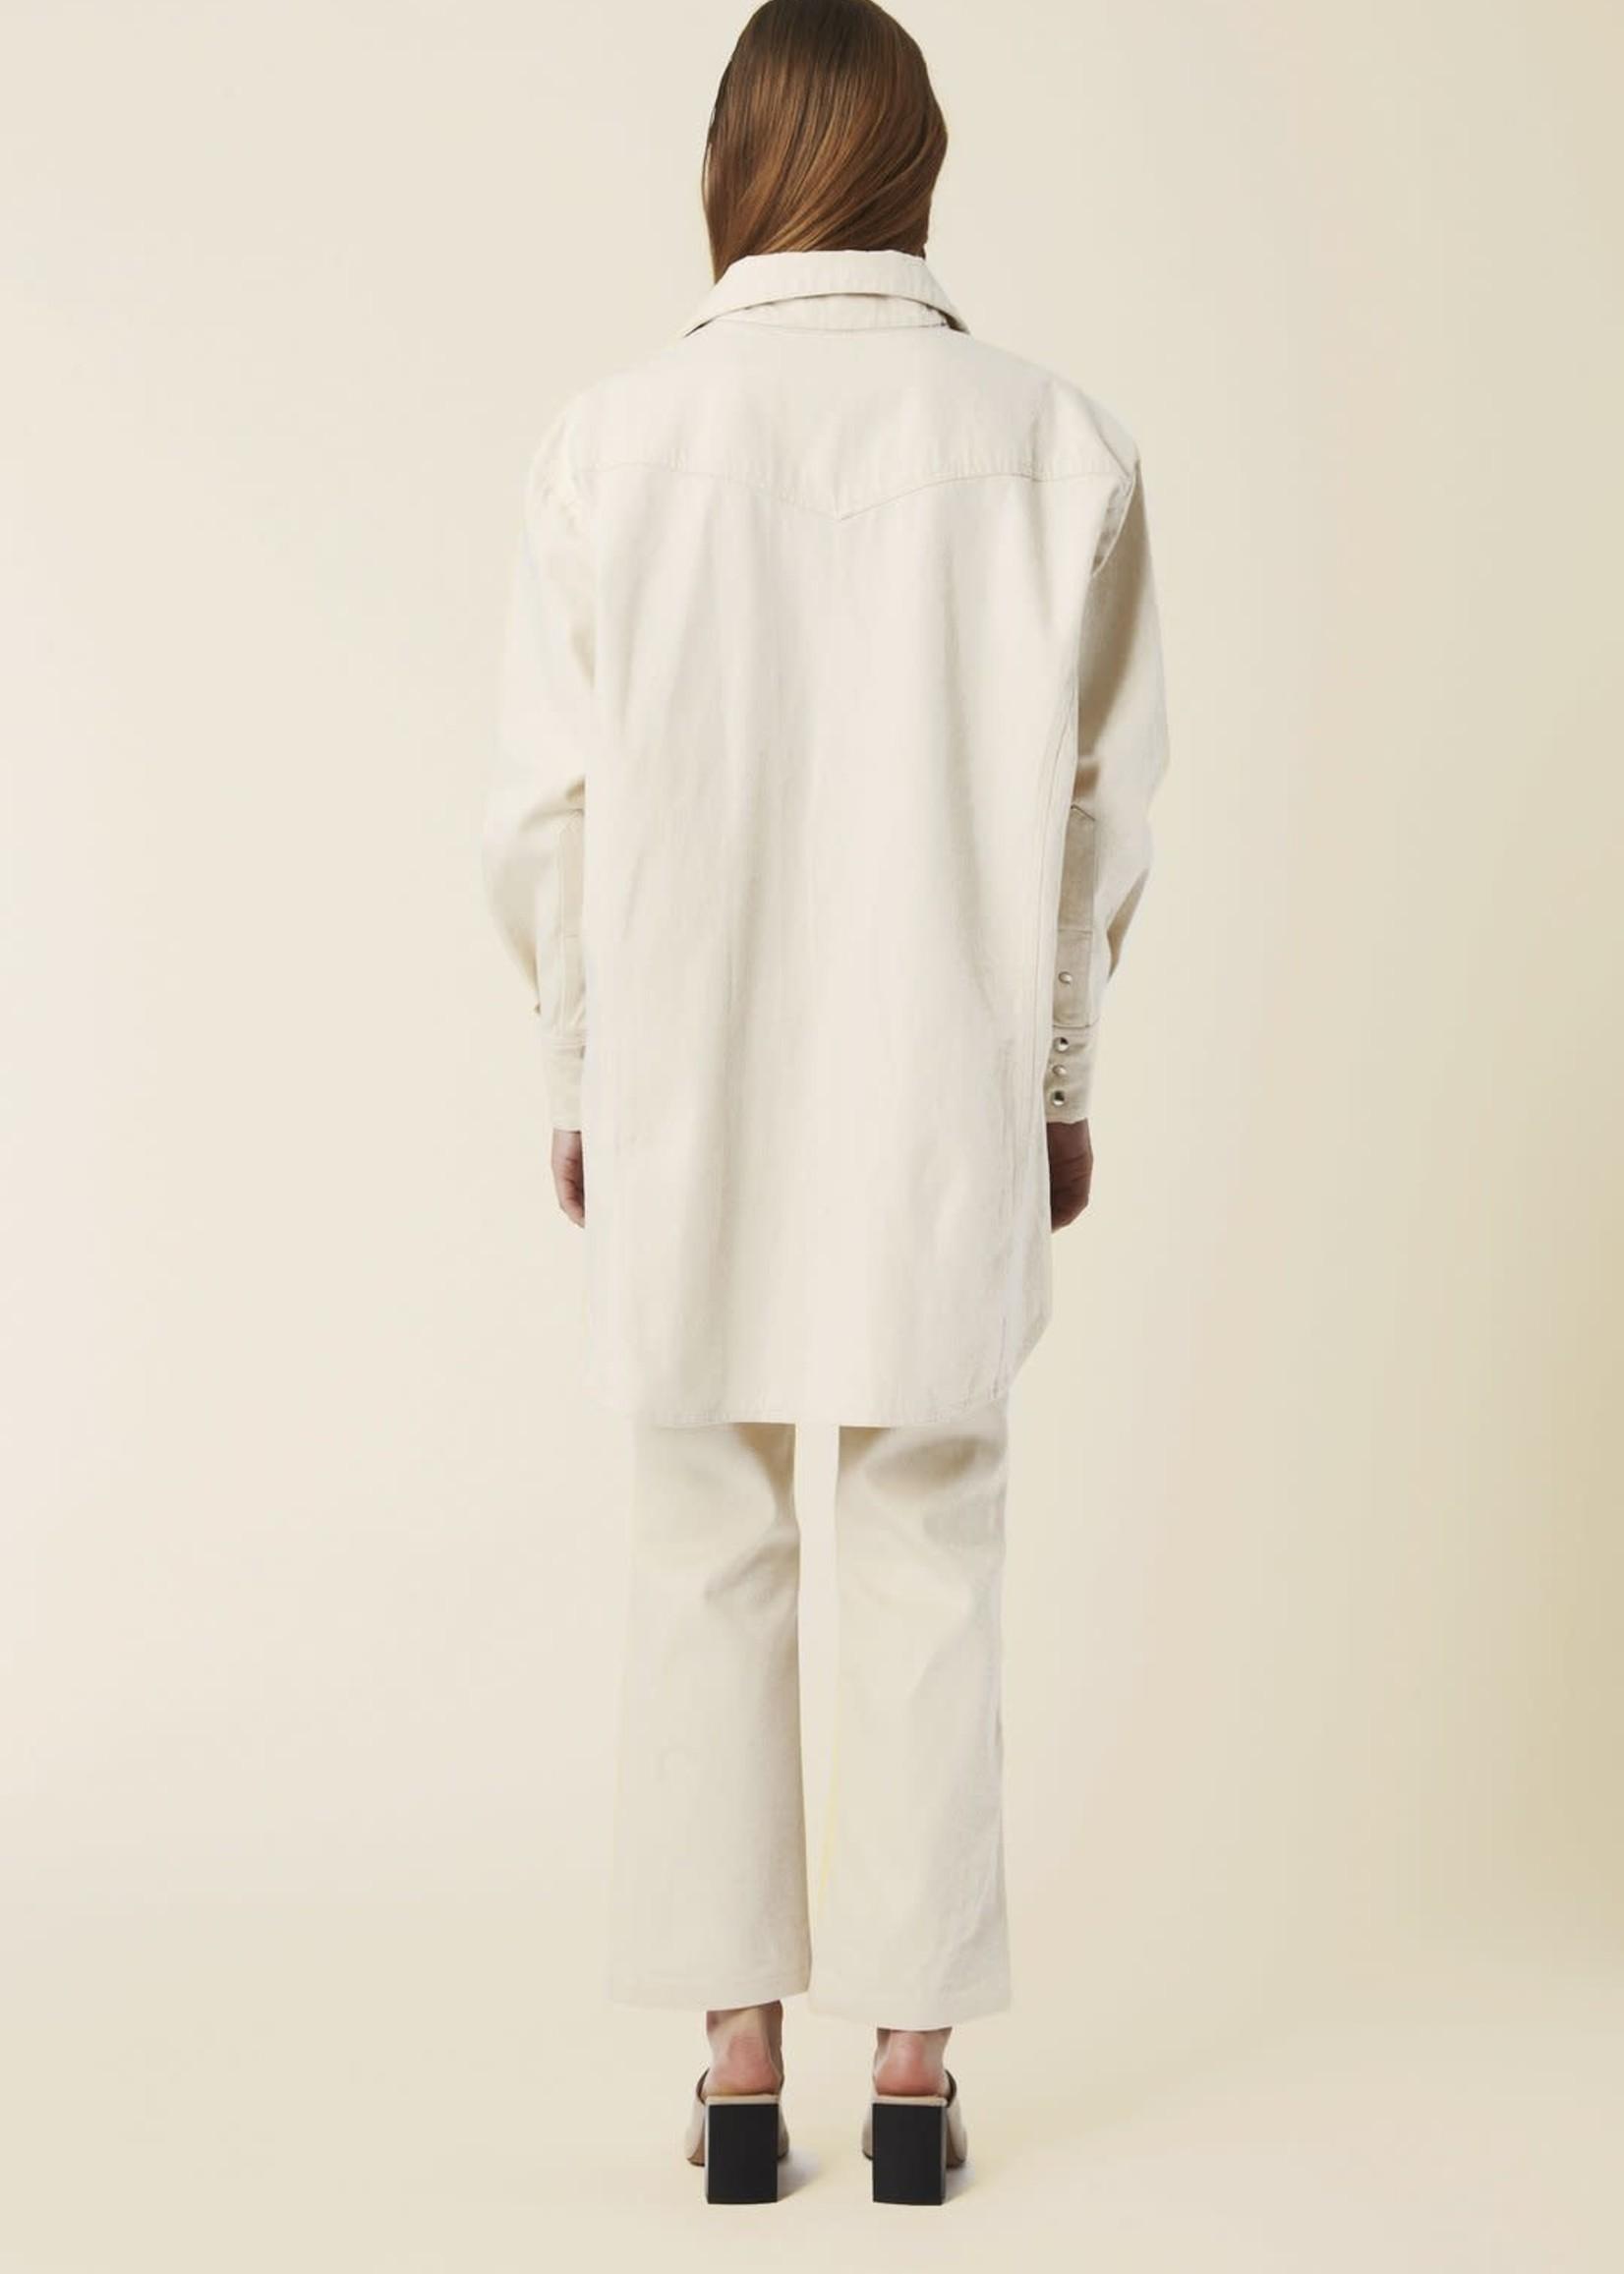 facon jacmin facon jacmin oversized shirt dress /jacket ecru